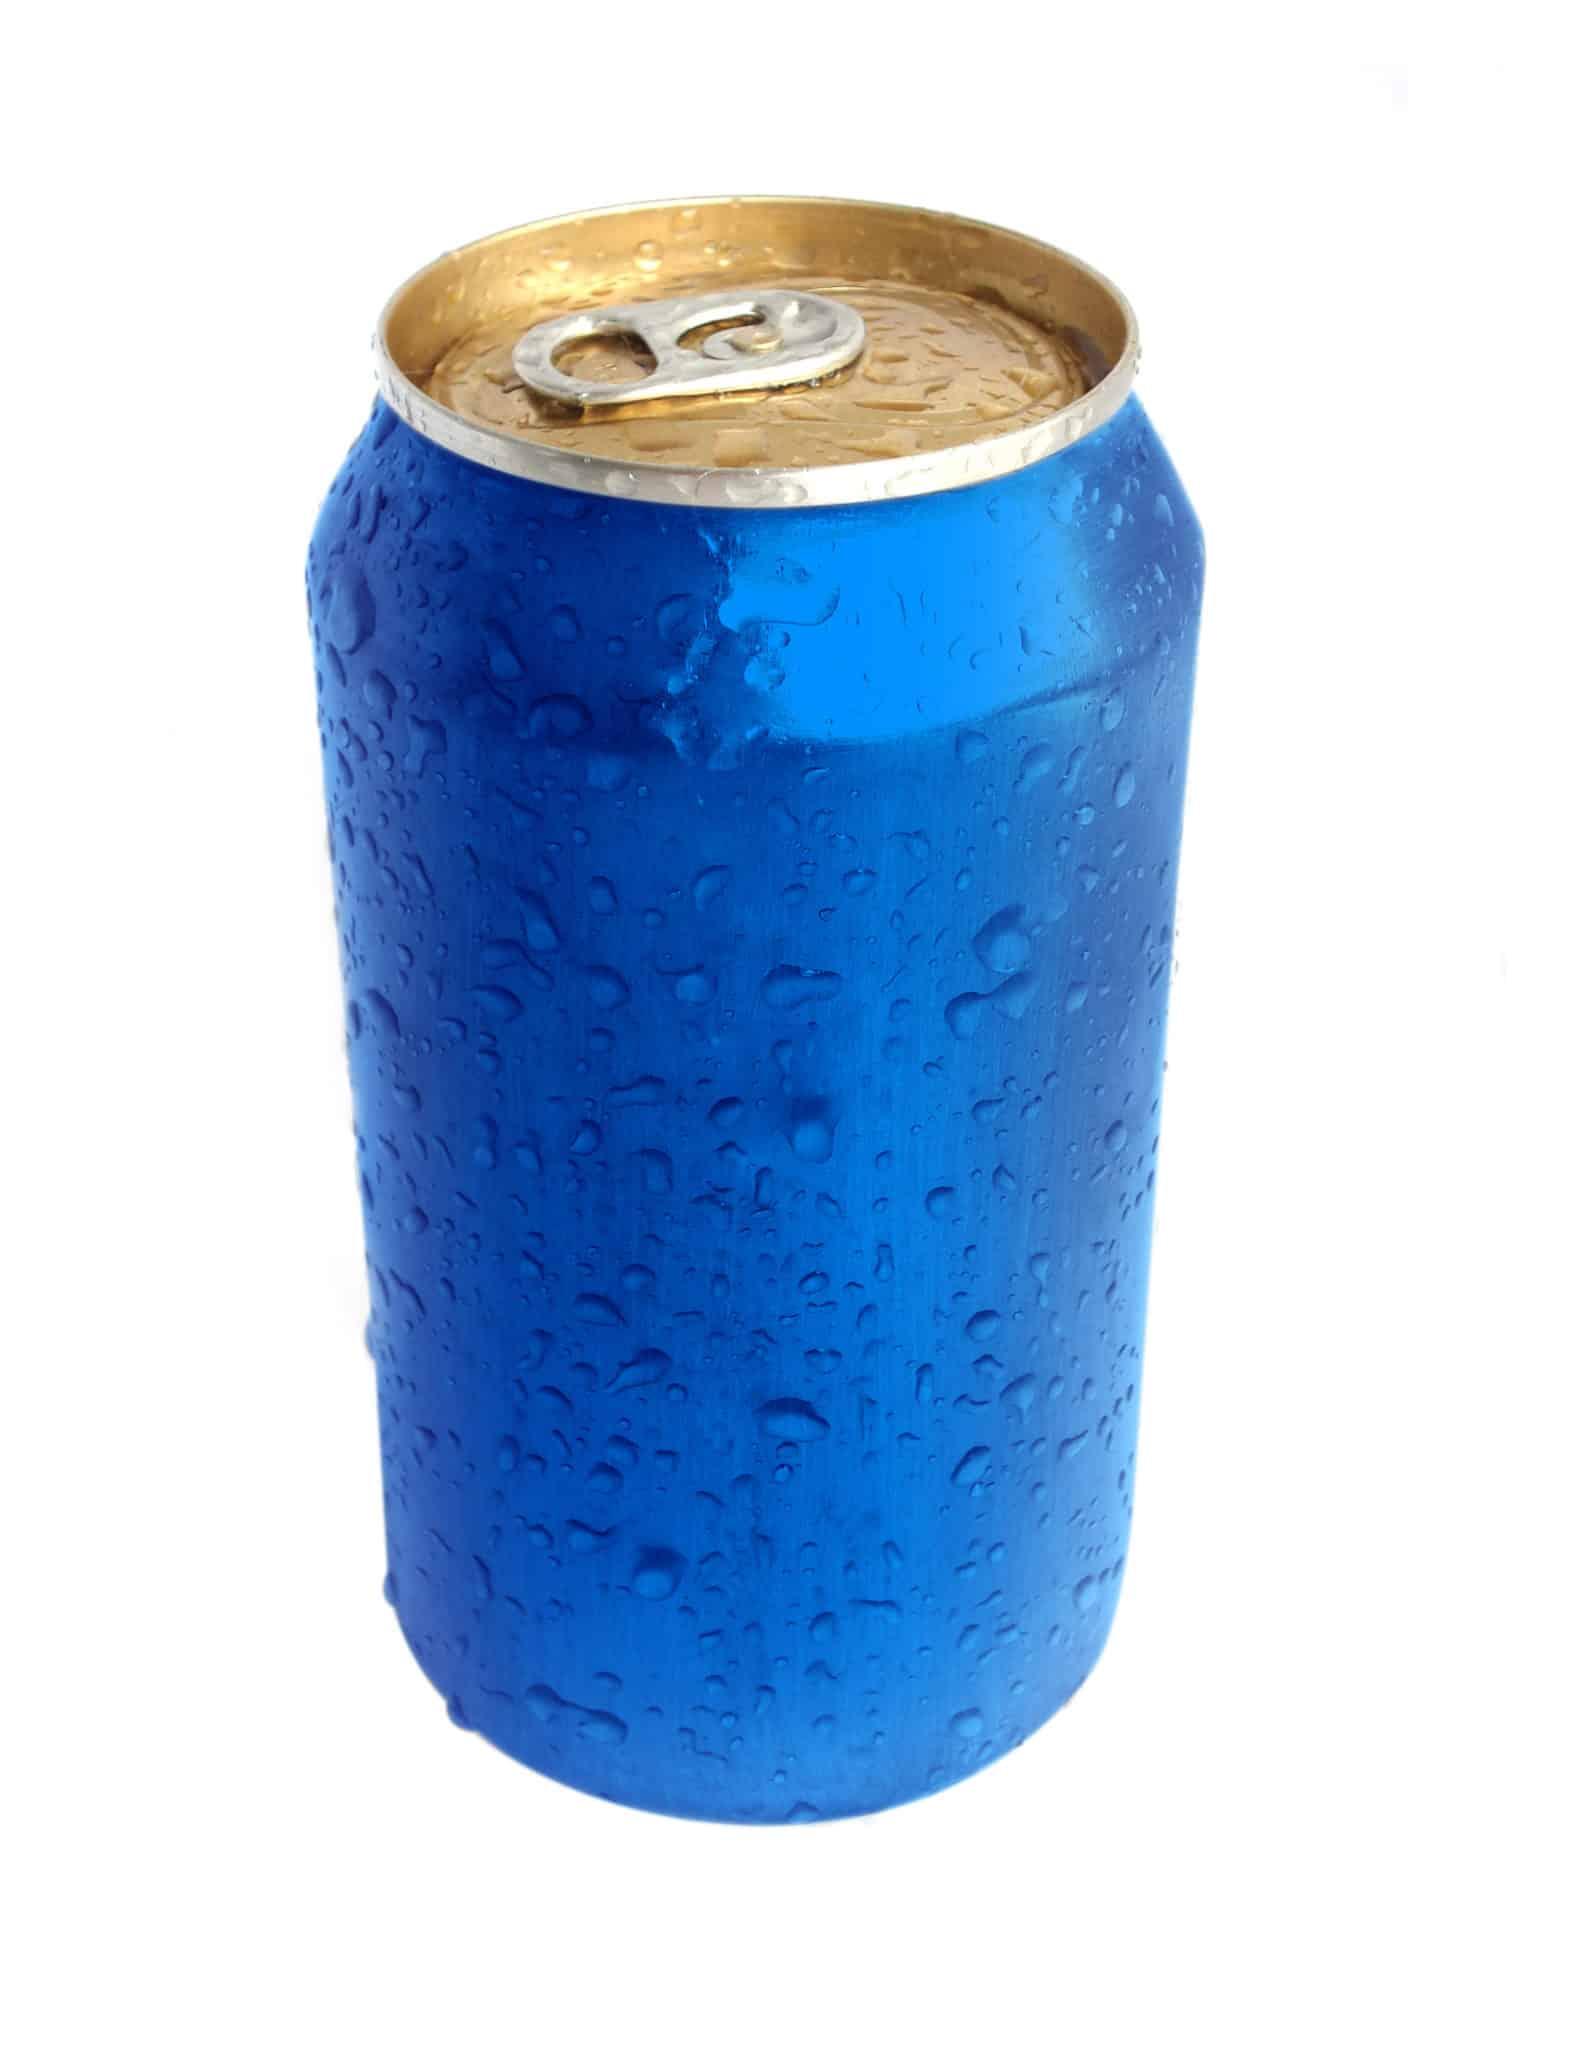 Drink Can From Blank Aluminum Stock Photo: Shawn Soszka, N.D., L.Ac